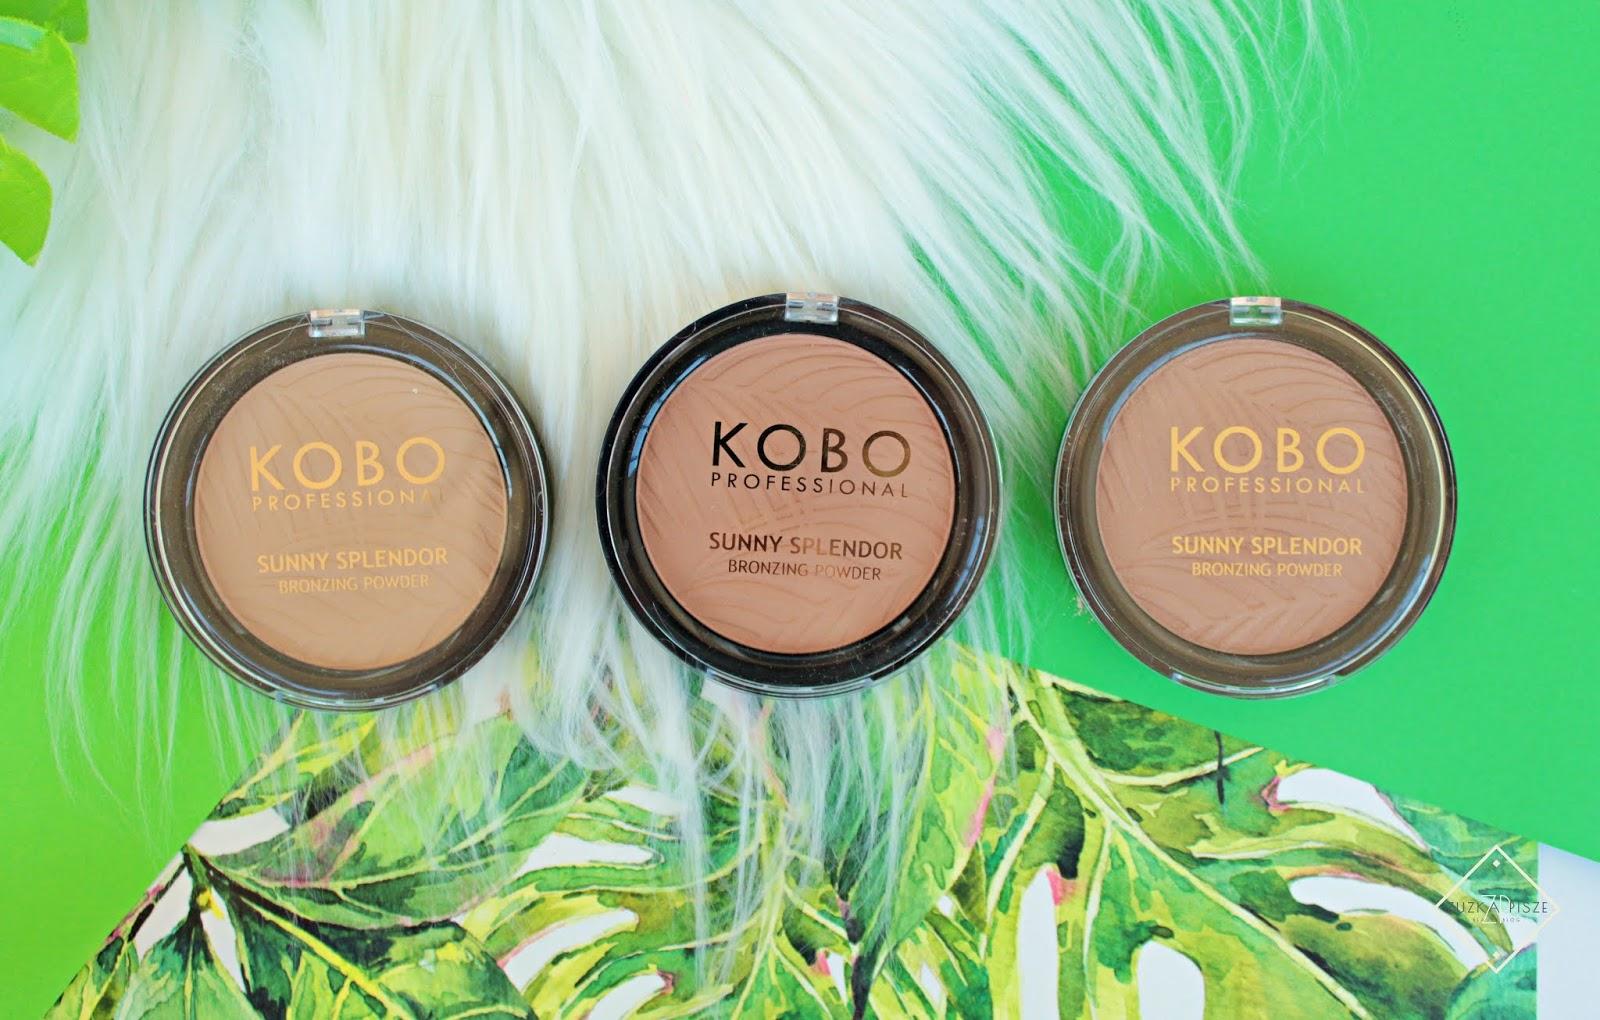 Kobo Professional Sunny Splendor - bronzer